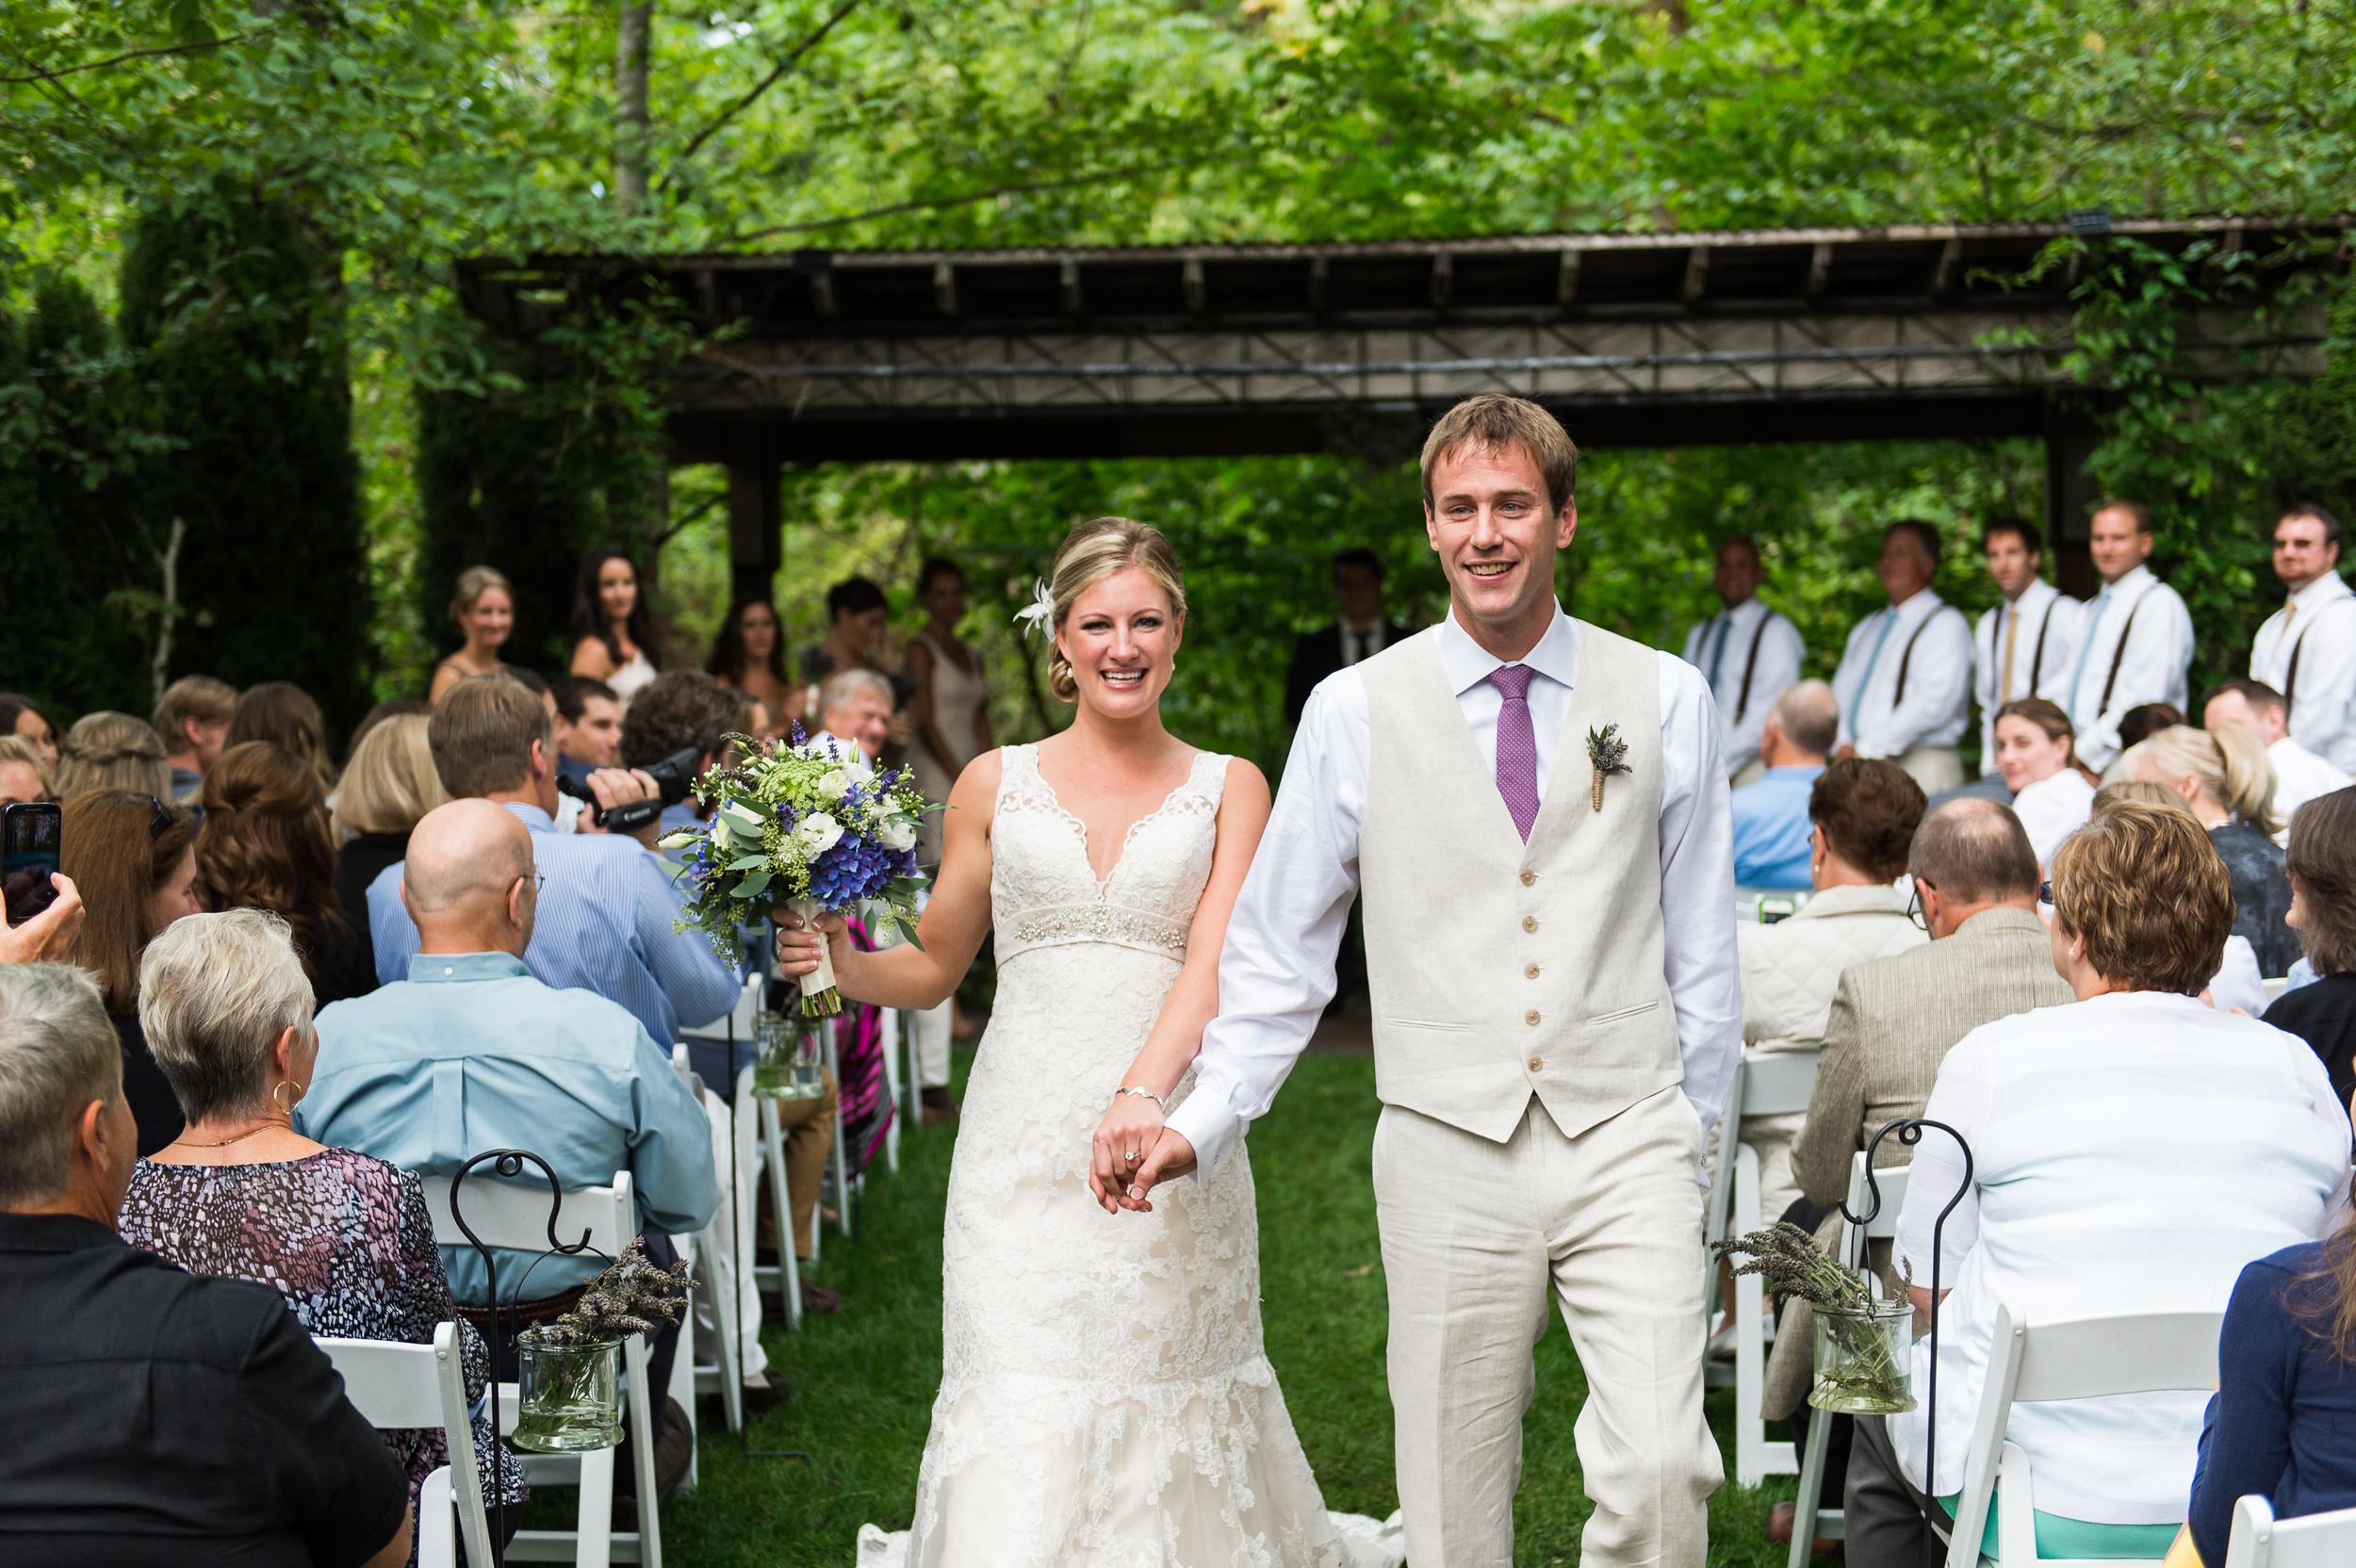 JJ-wedding-Van-Wyhe-Photography-413.jpg